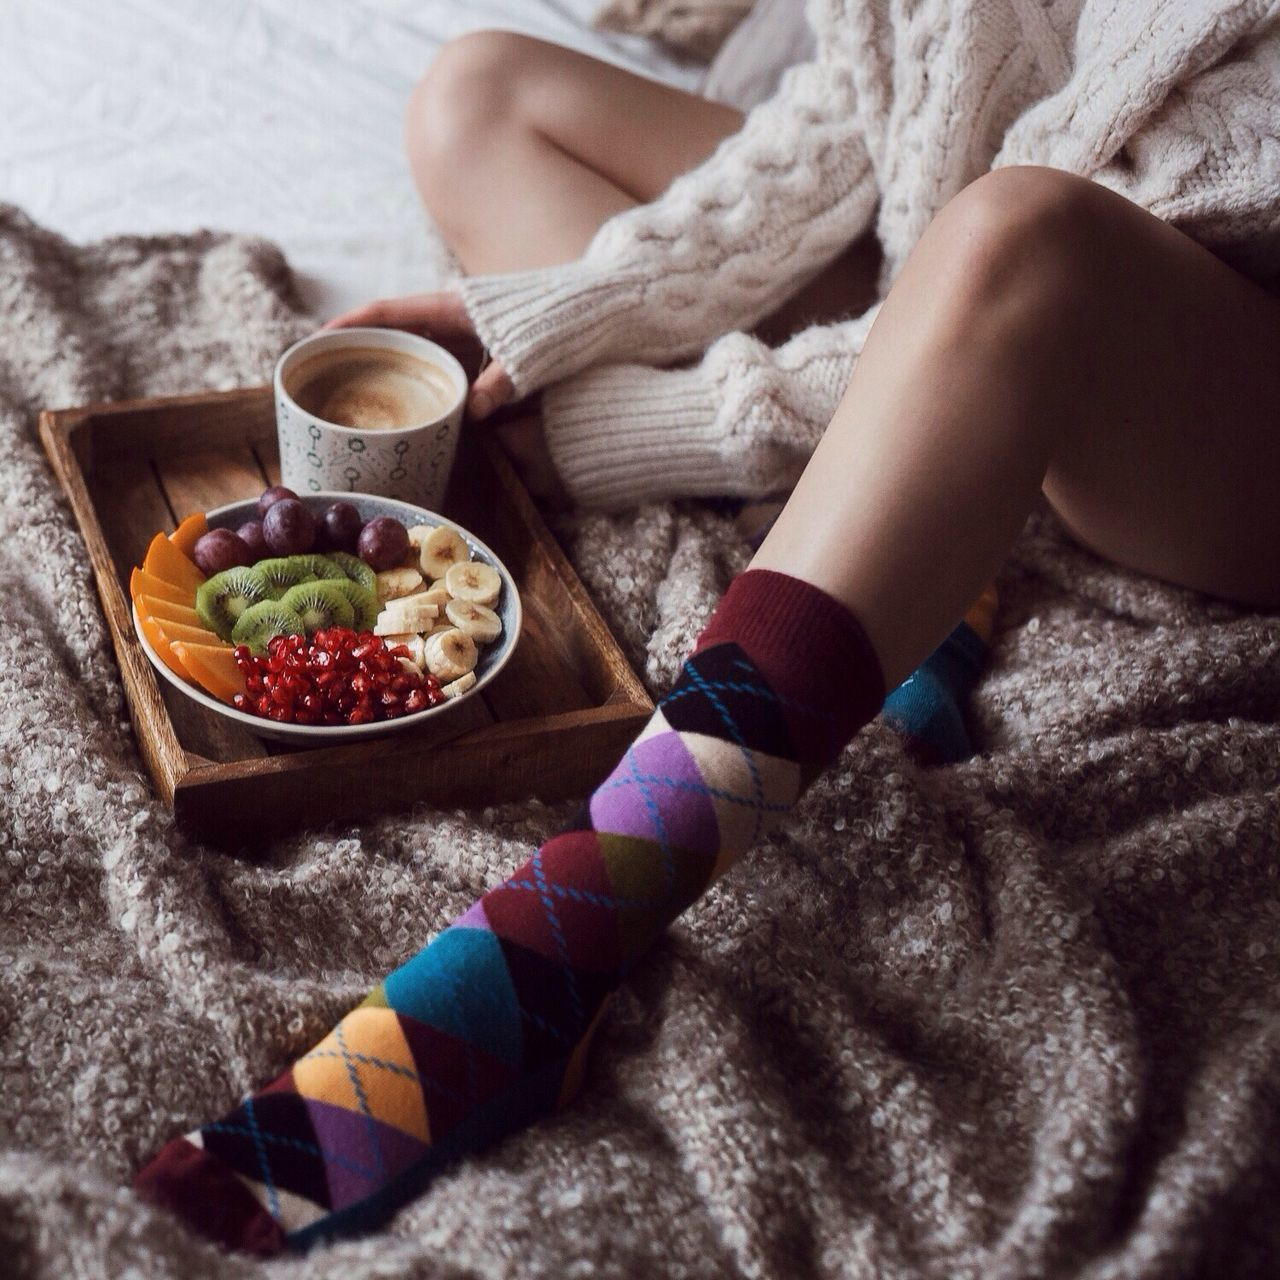 My Favorite Breakfast Moment Breakfast Bed Cozy Socks Socksoftheday Home Tablet Coffee Girl Leg Sweaterweather Vegan Food Healthy Food Market Reviewers' Top Picks EyeEm X My Muesli - Breakfast Moment